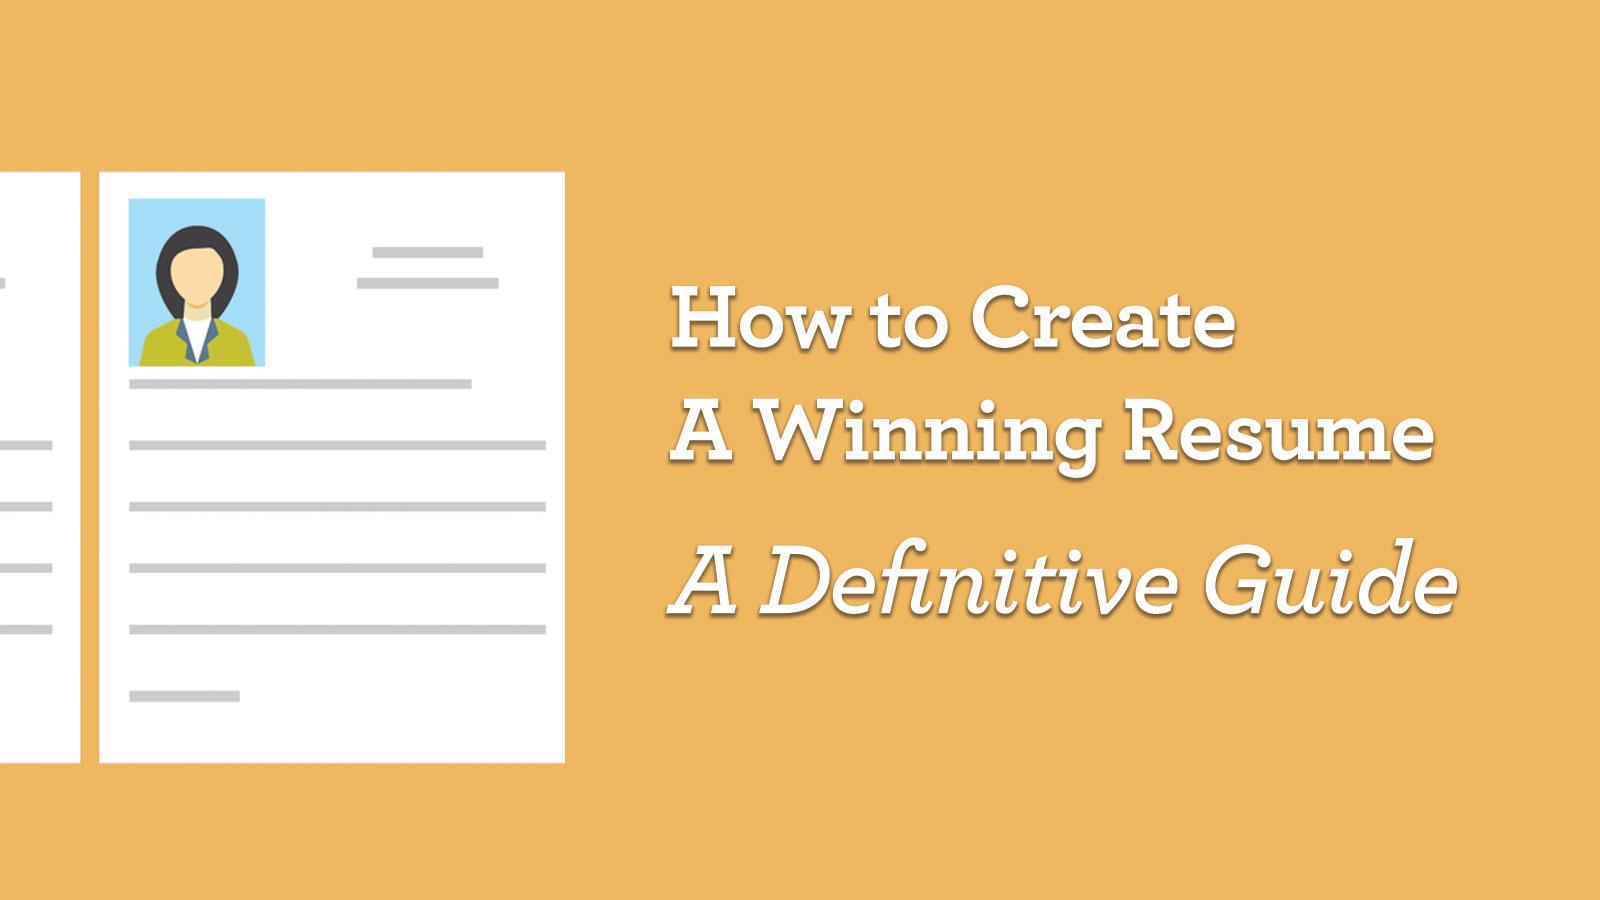 How To Create A Winning Resume Getfive